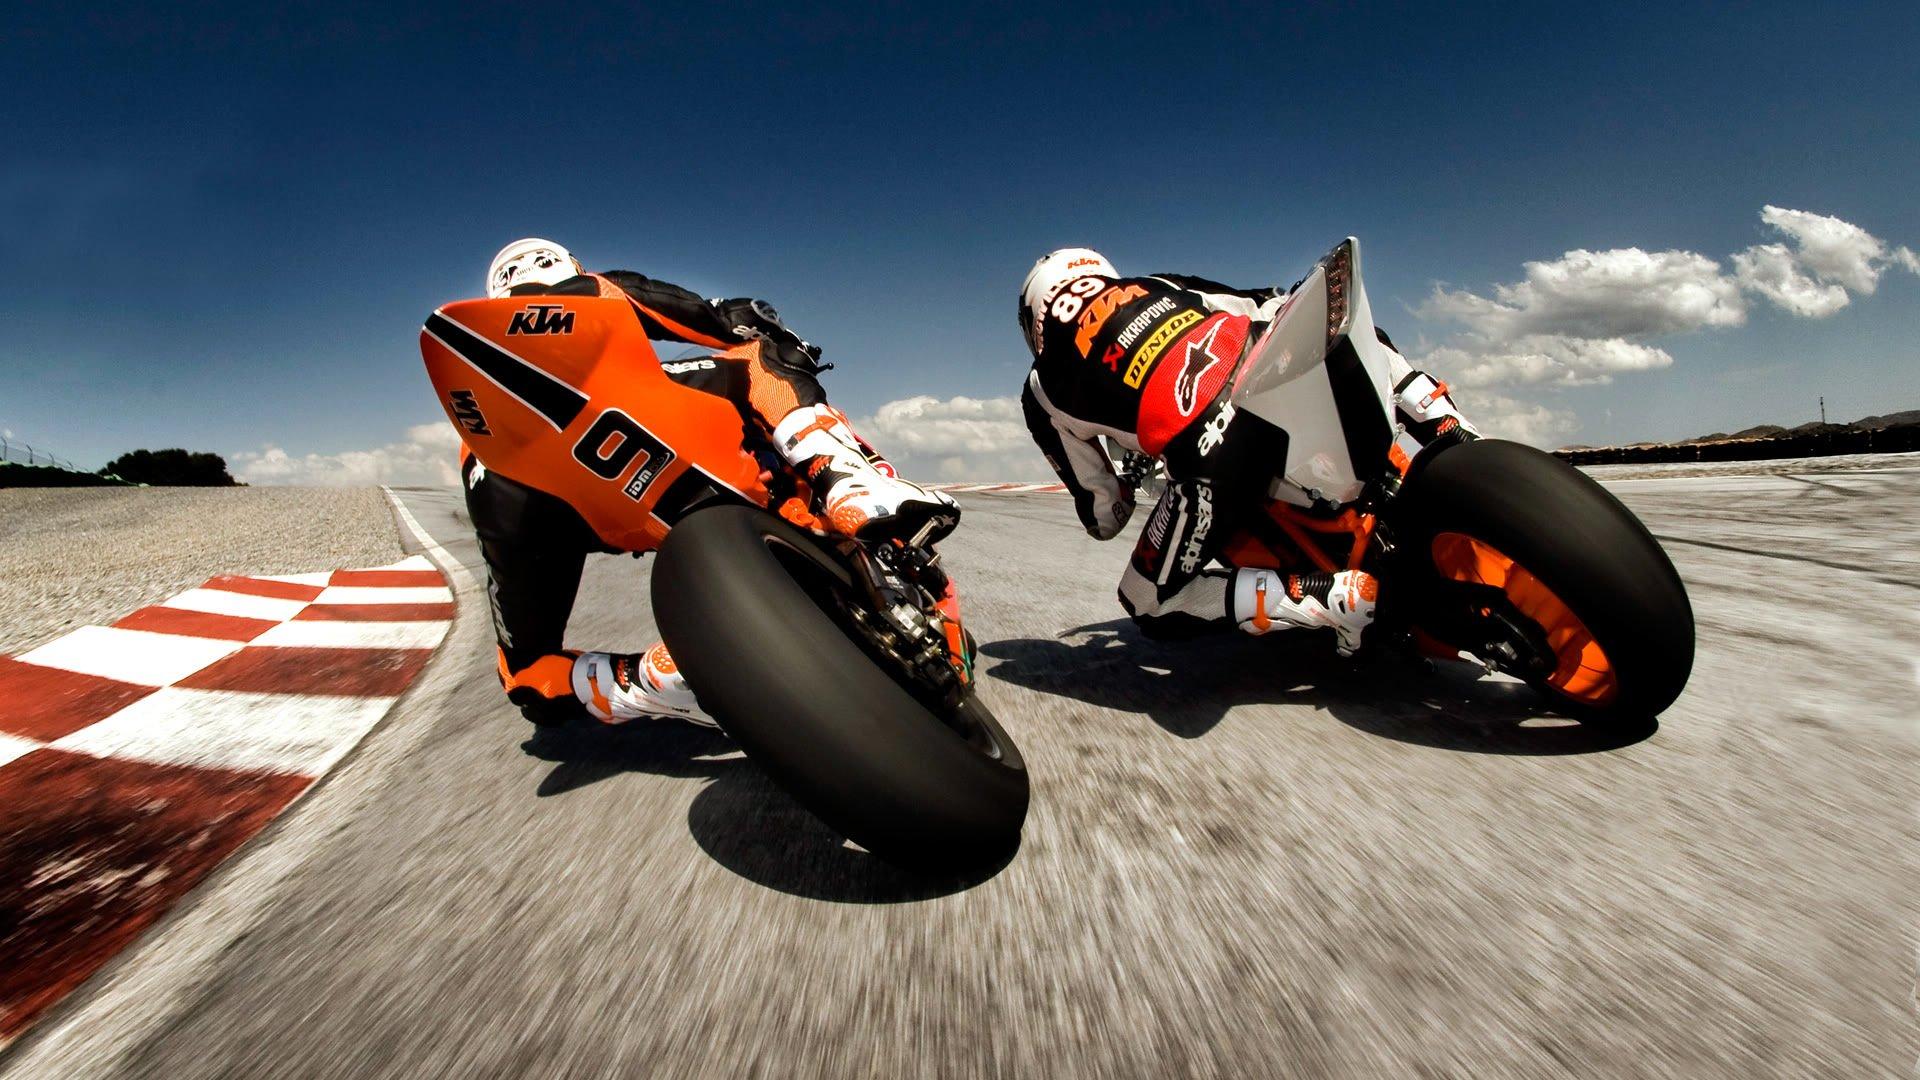 мотоцикл зеленый вираж гонщик онлайн